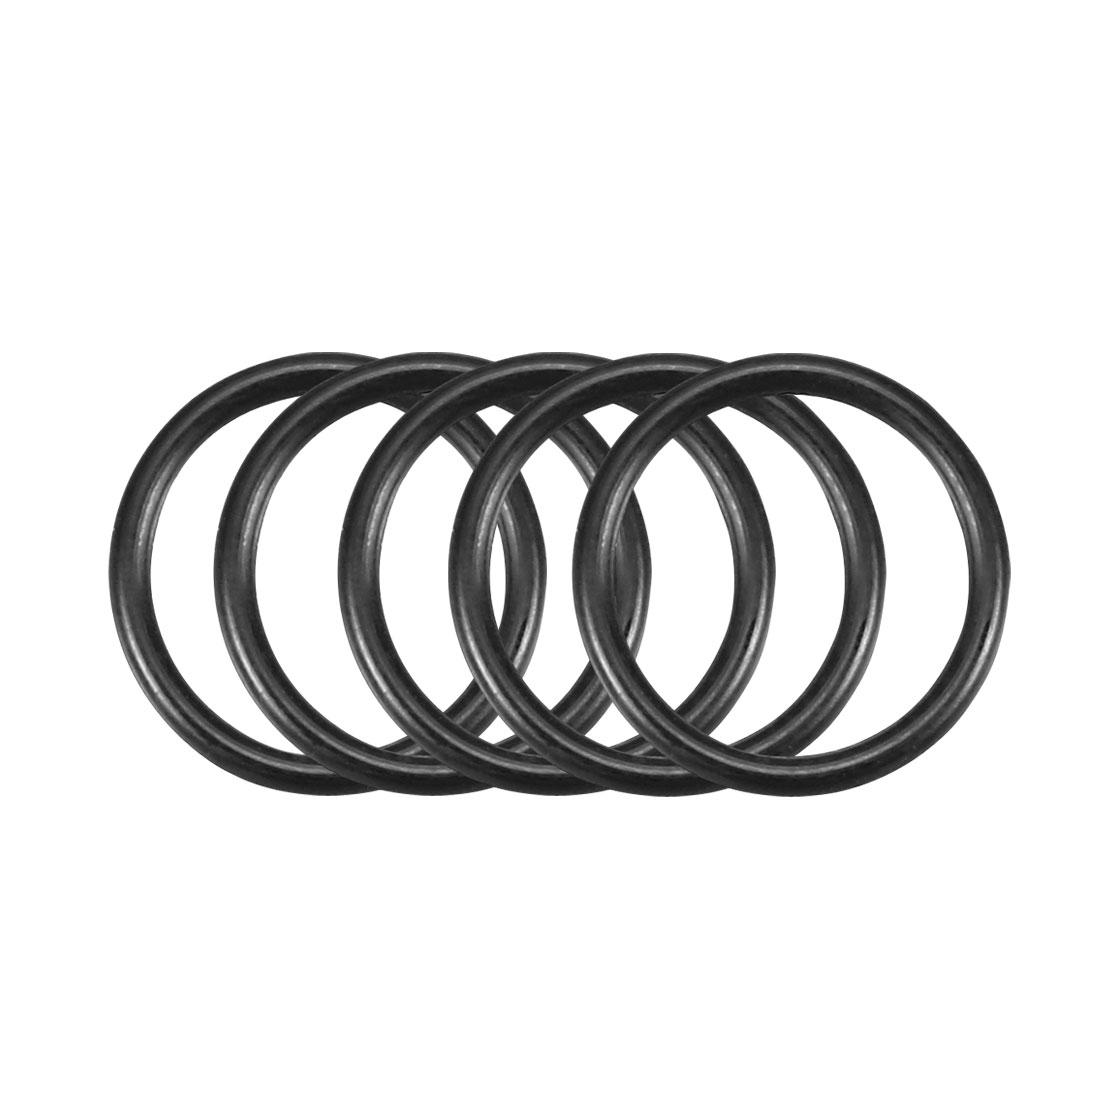 50Pcs Black 10mm x 1mm Nitrile Rubber O Ring NBR Oil Sealing Grommets